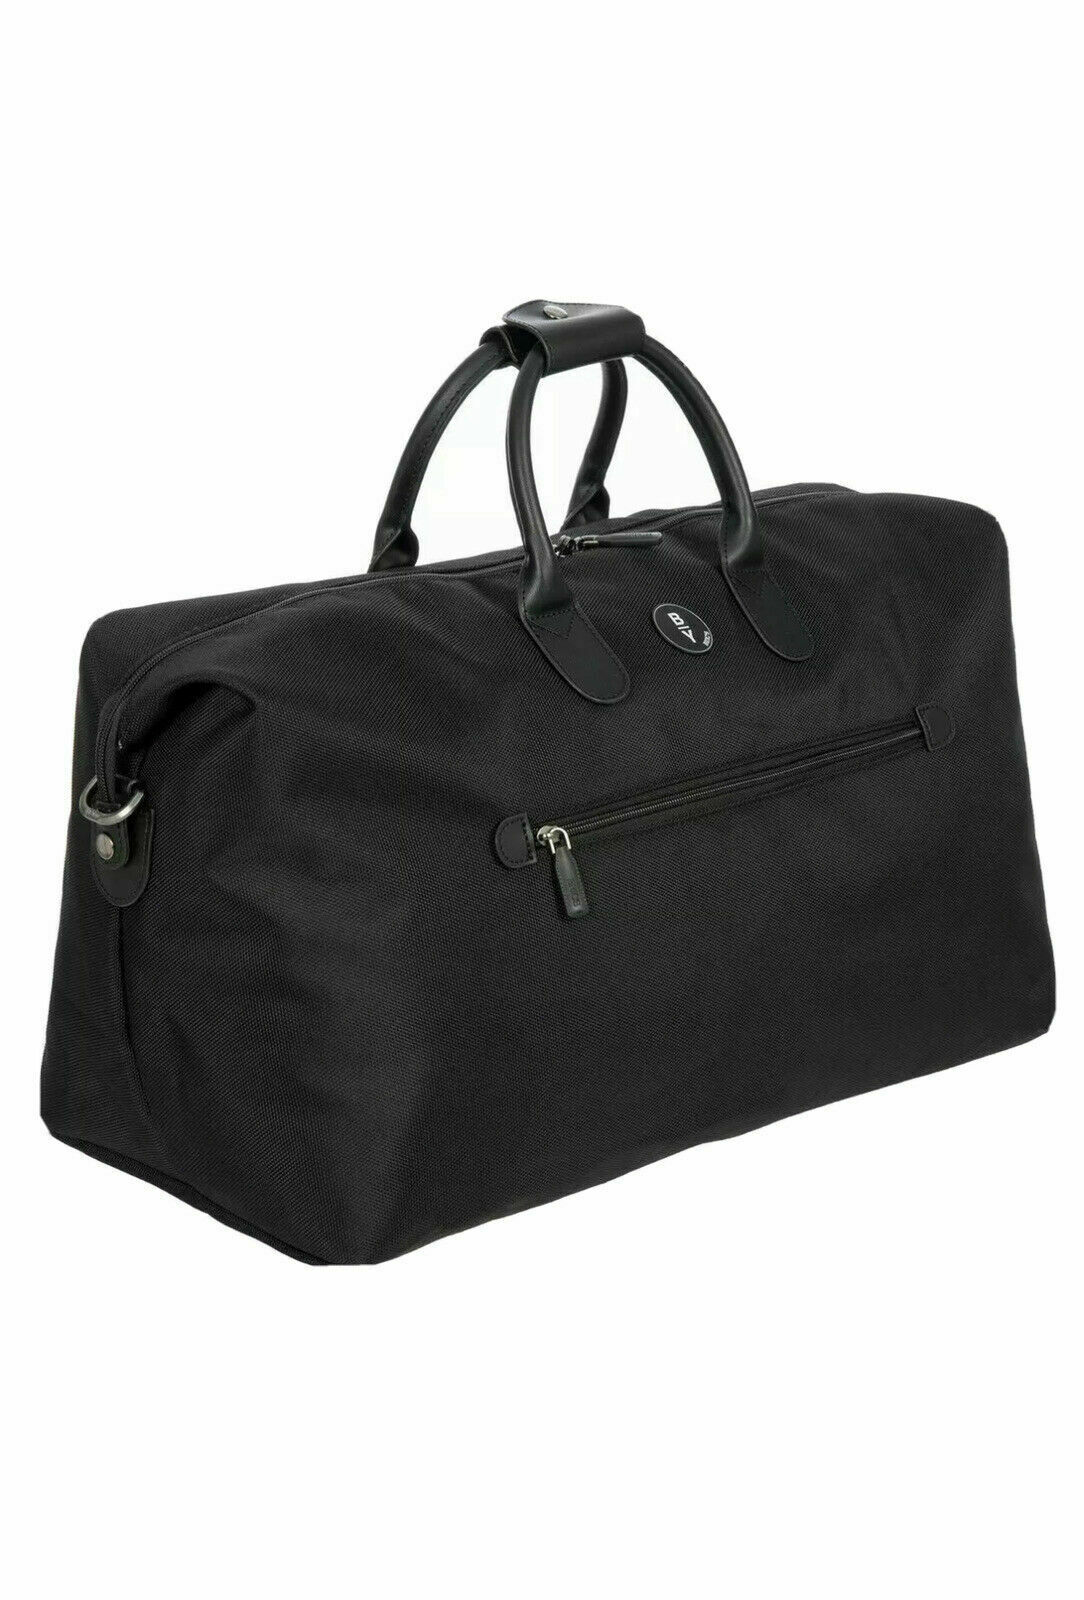 bric s zeus 22 duffle bag travelling